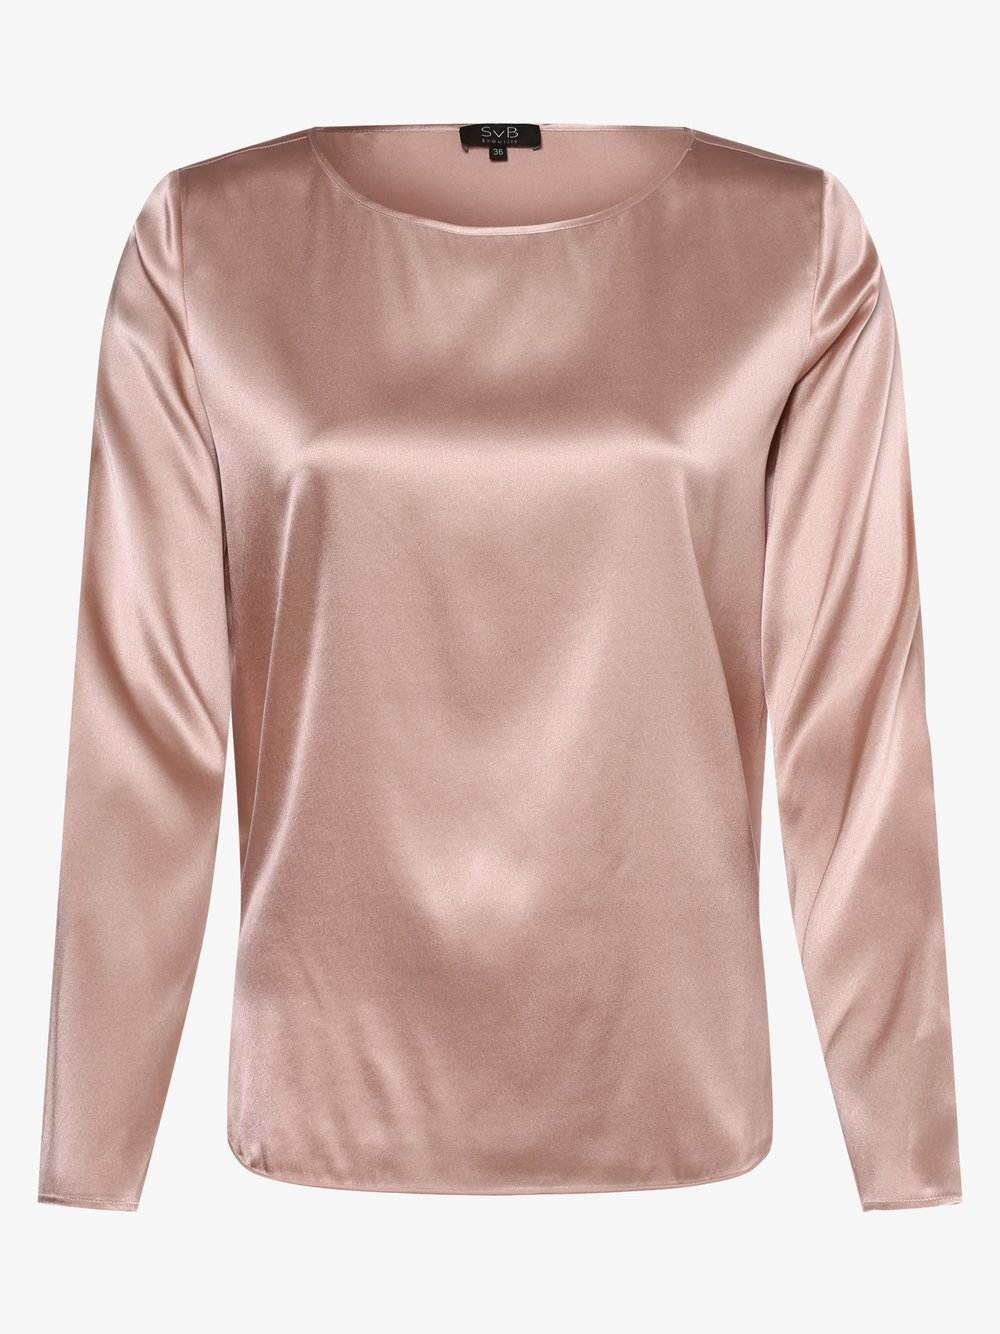 SvB Exquisit - Bluzka damska, różowy